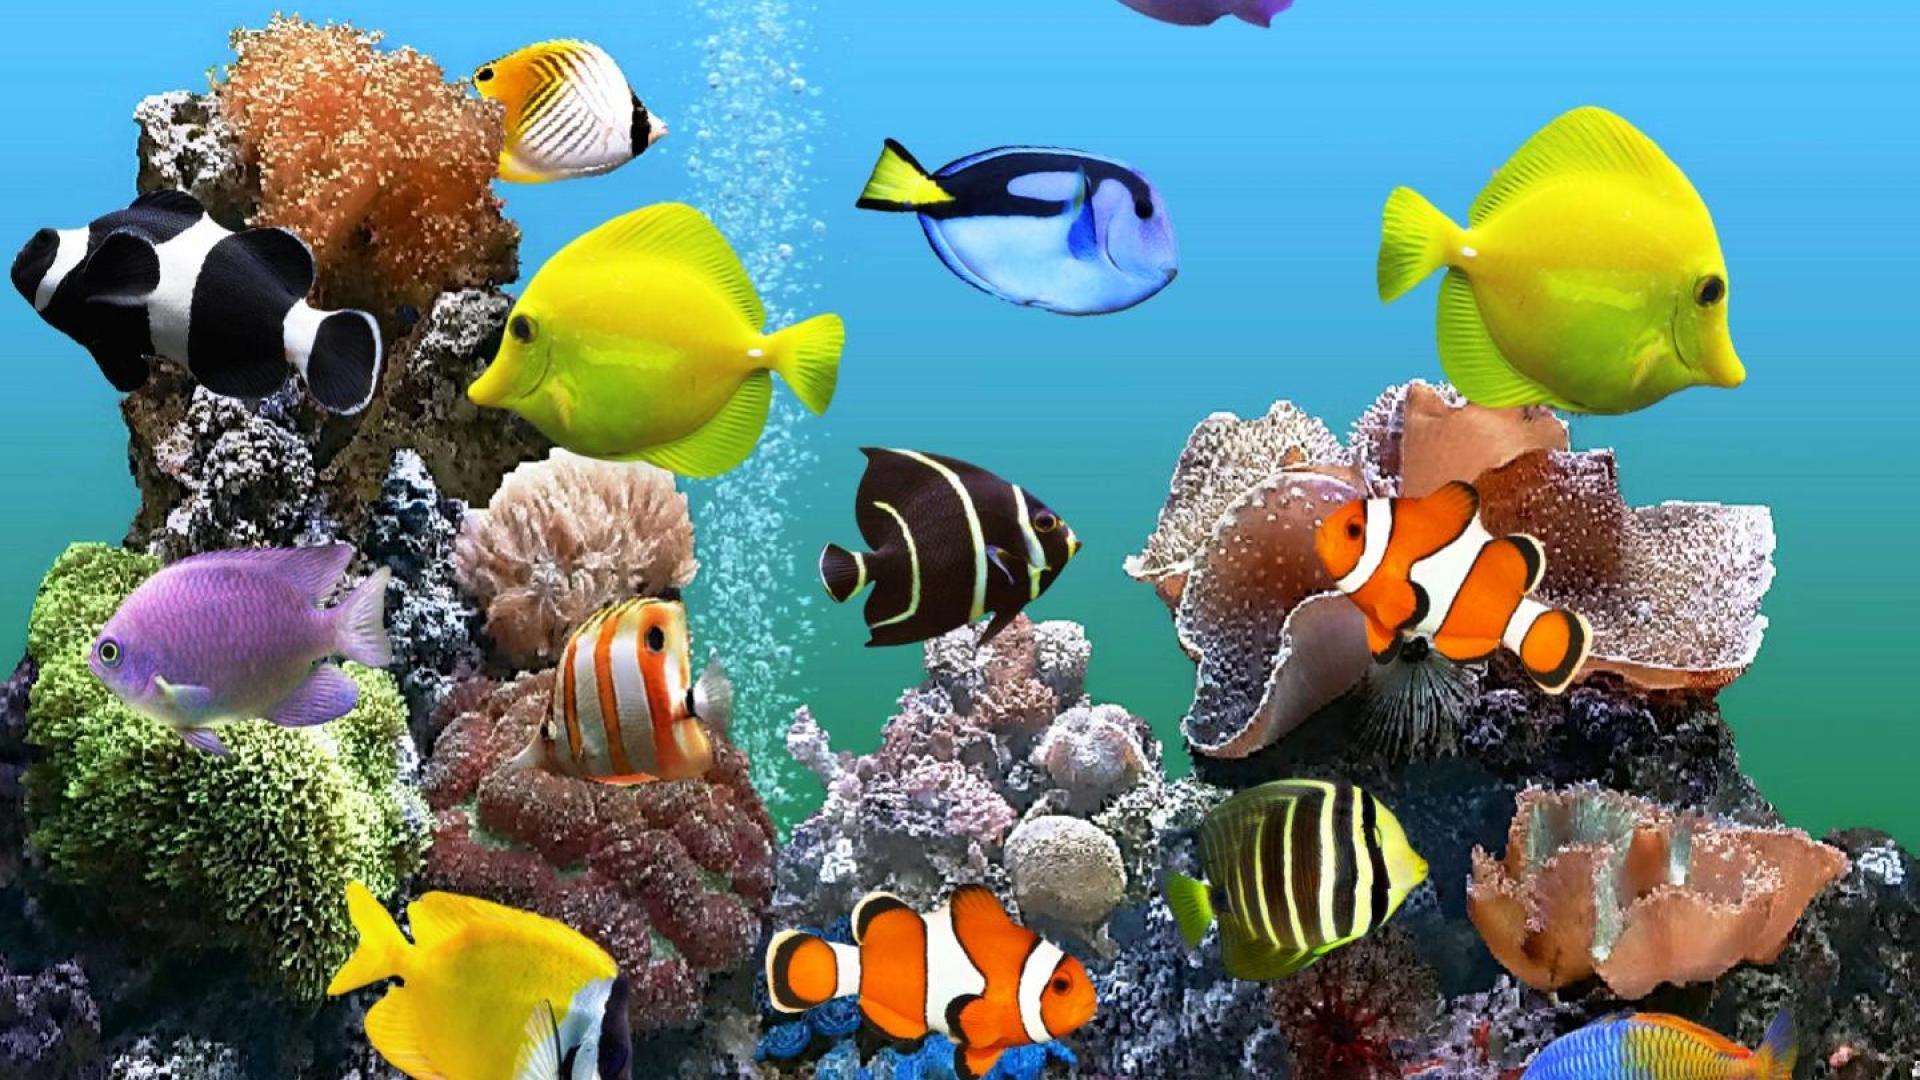 Marine Aquarium Hd Wallpapers 7wallpapers Net